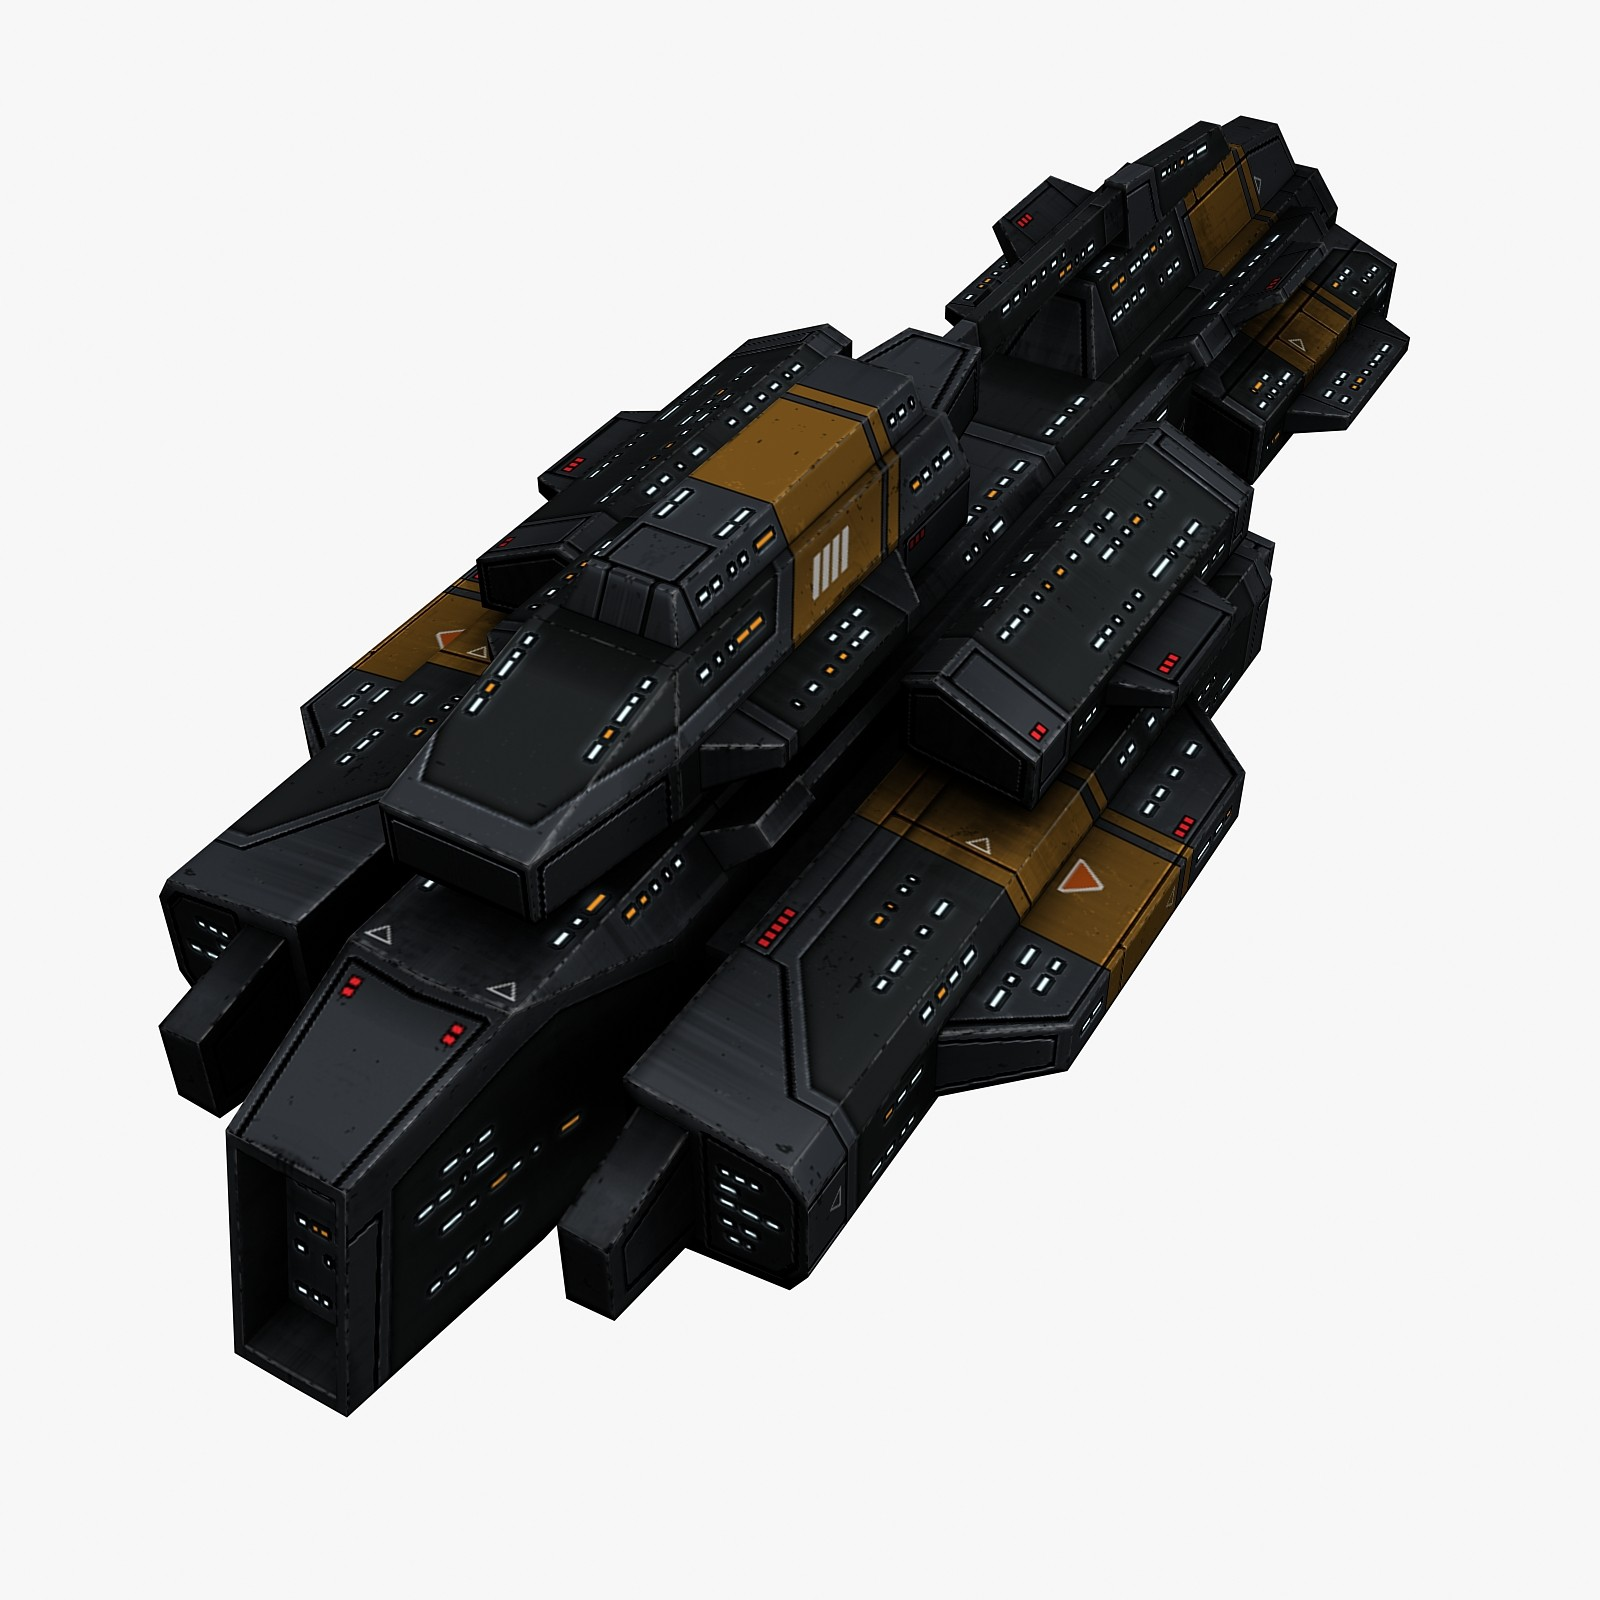 space_battleship_5_preview_1.jpg